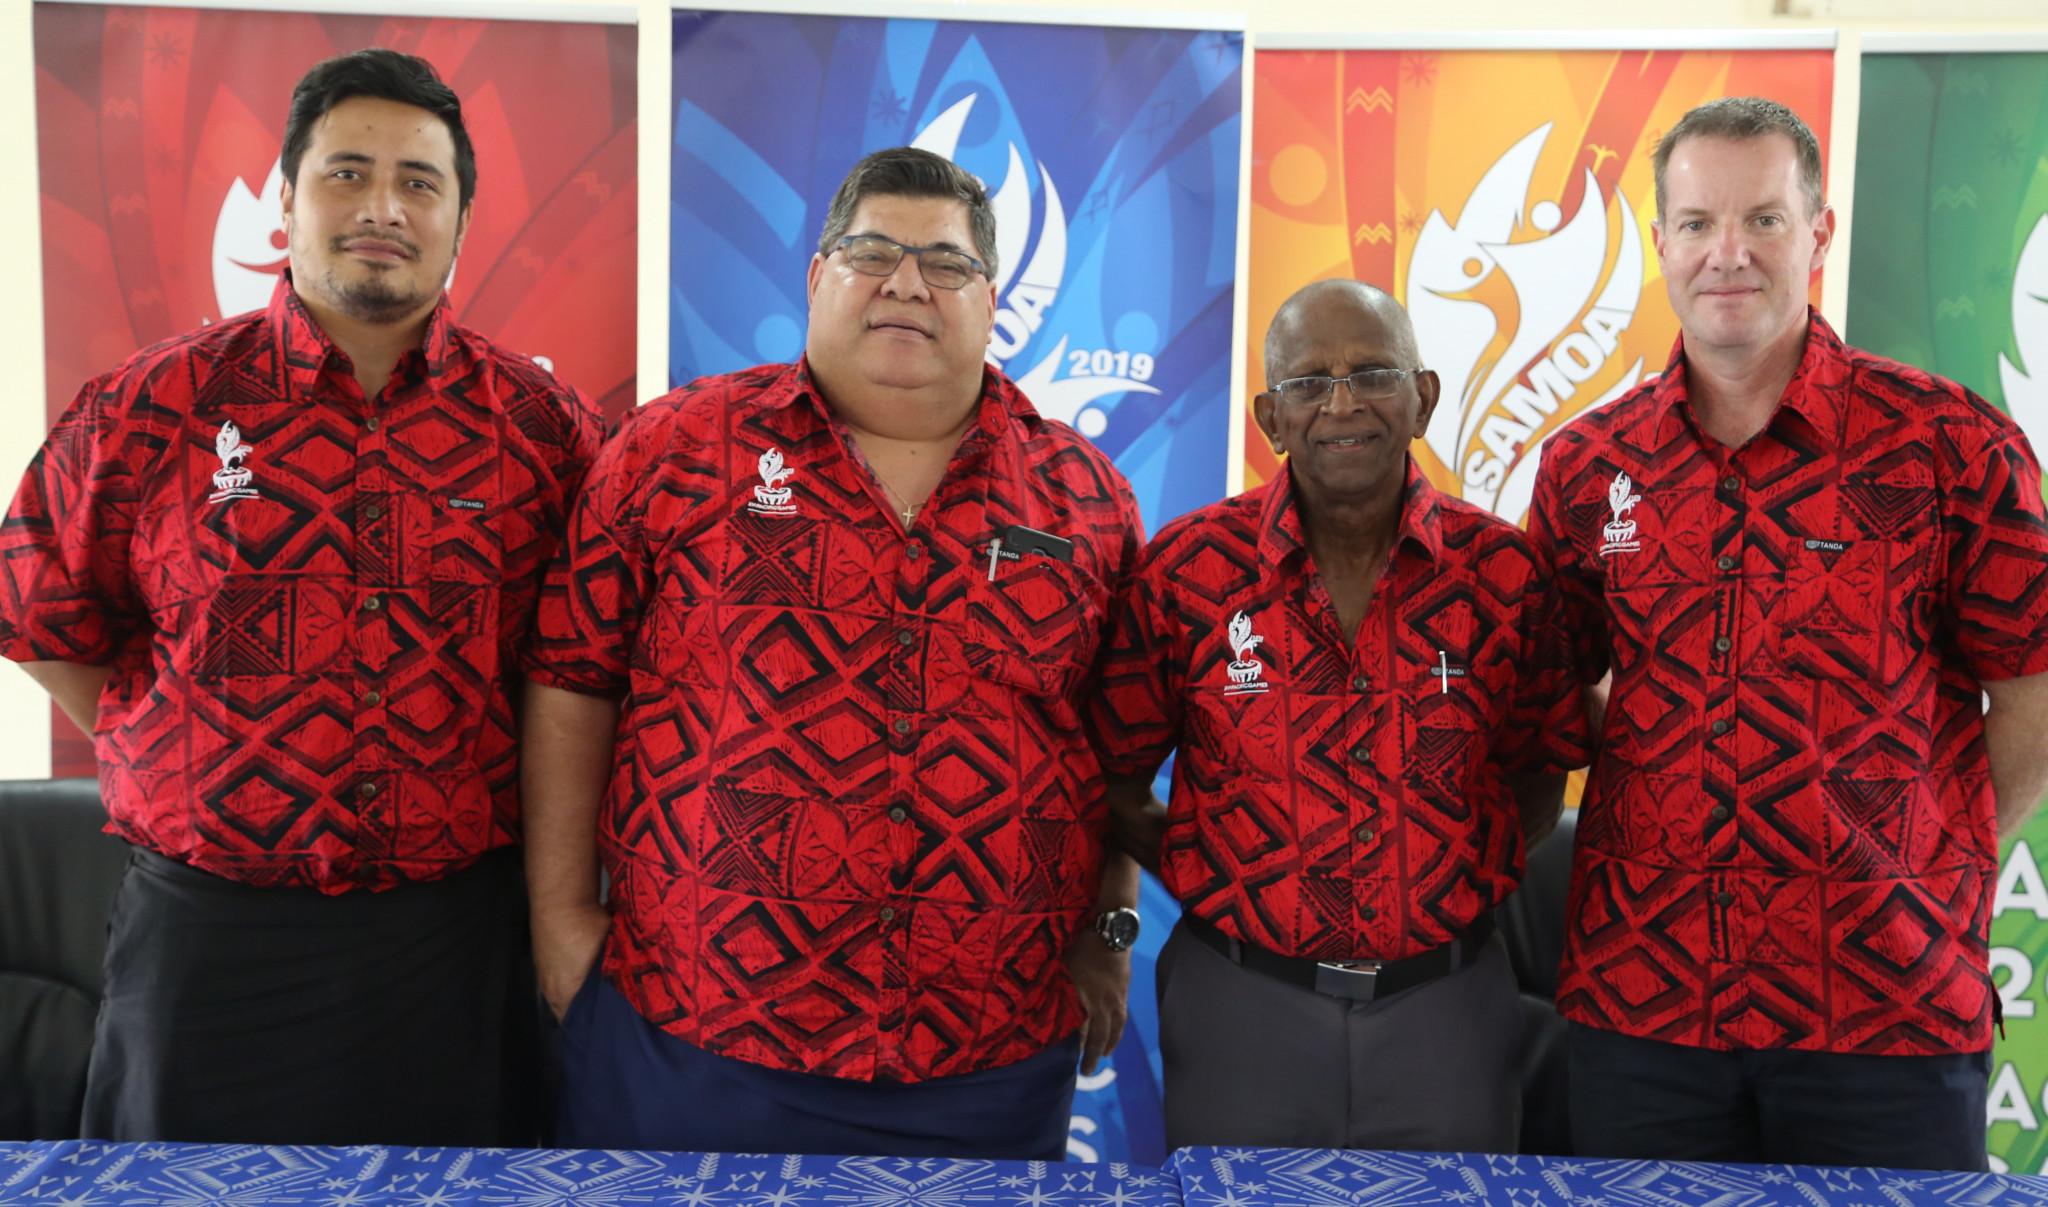 PGC President Samoa Vidhya Lakhan led a deputation to the Samoan capital of Apia  ©PGC